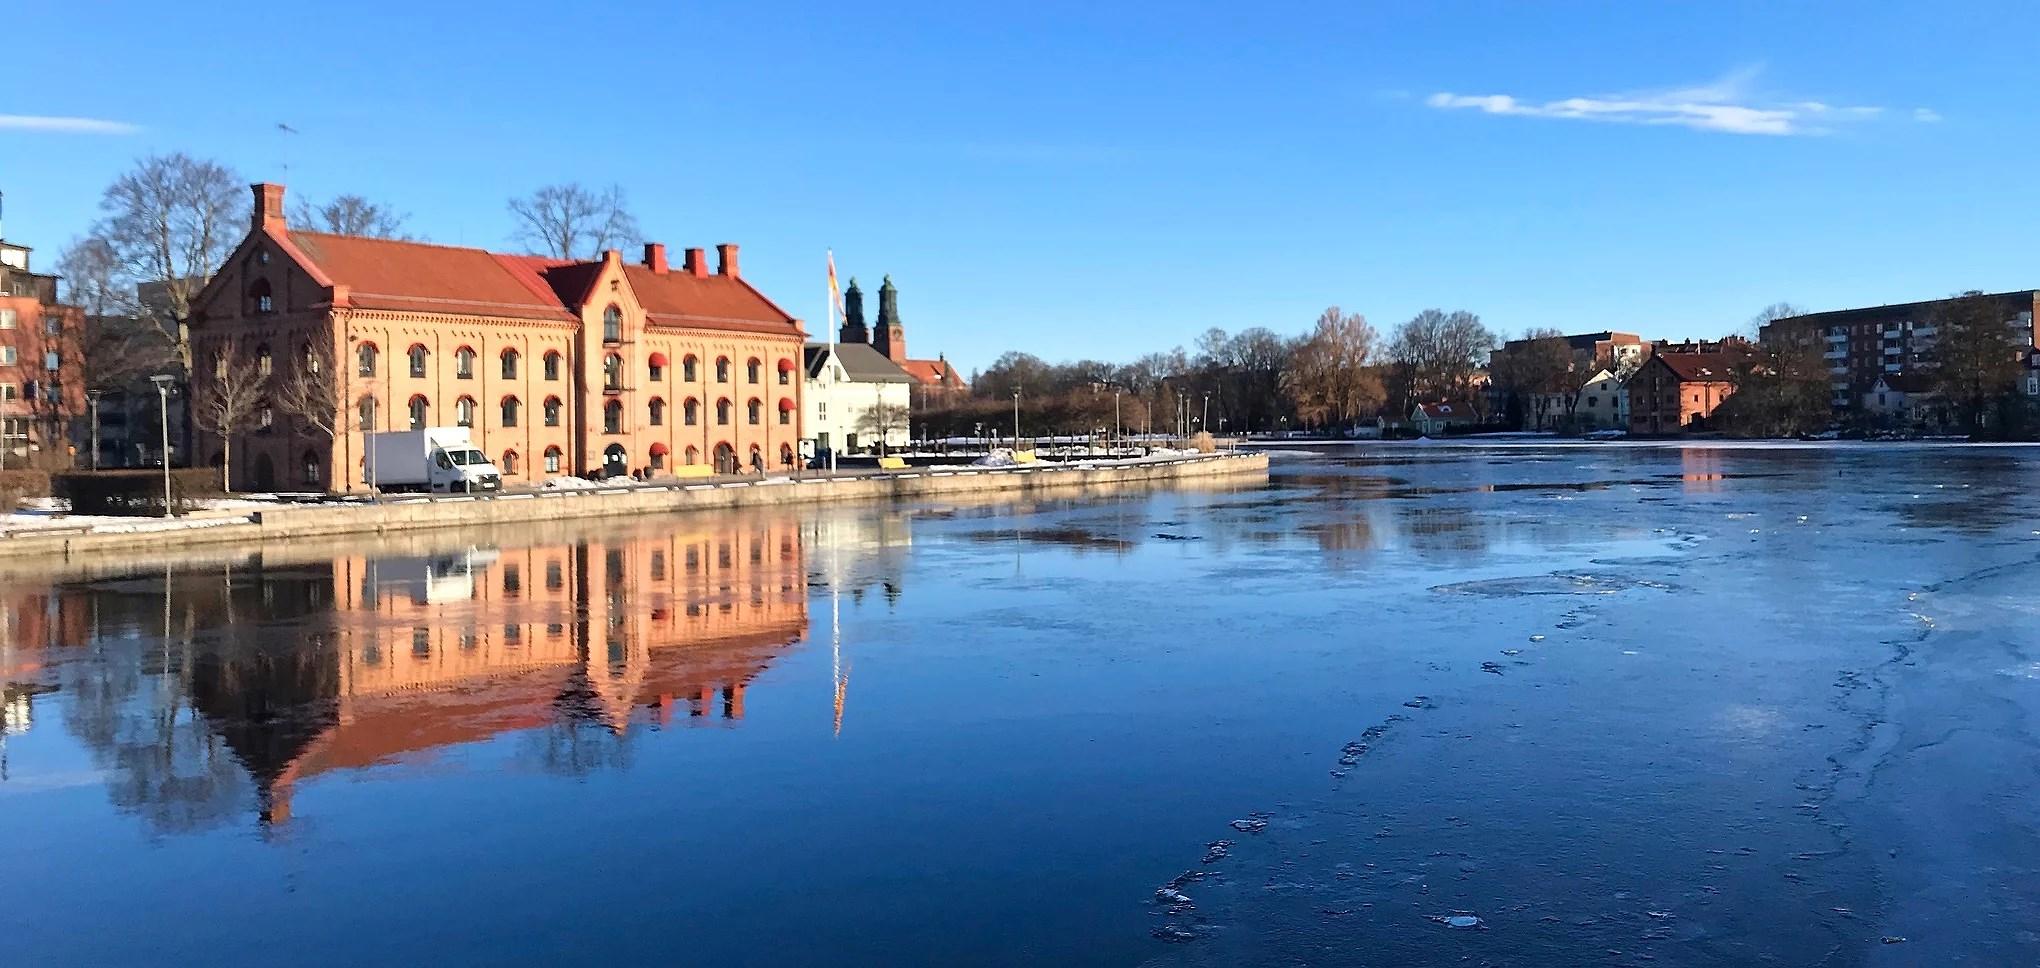 Morning walk in Eskilstuna